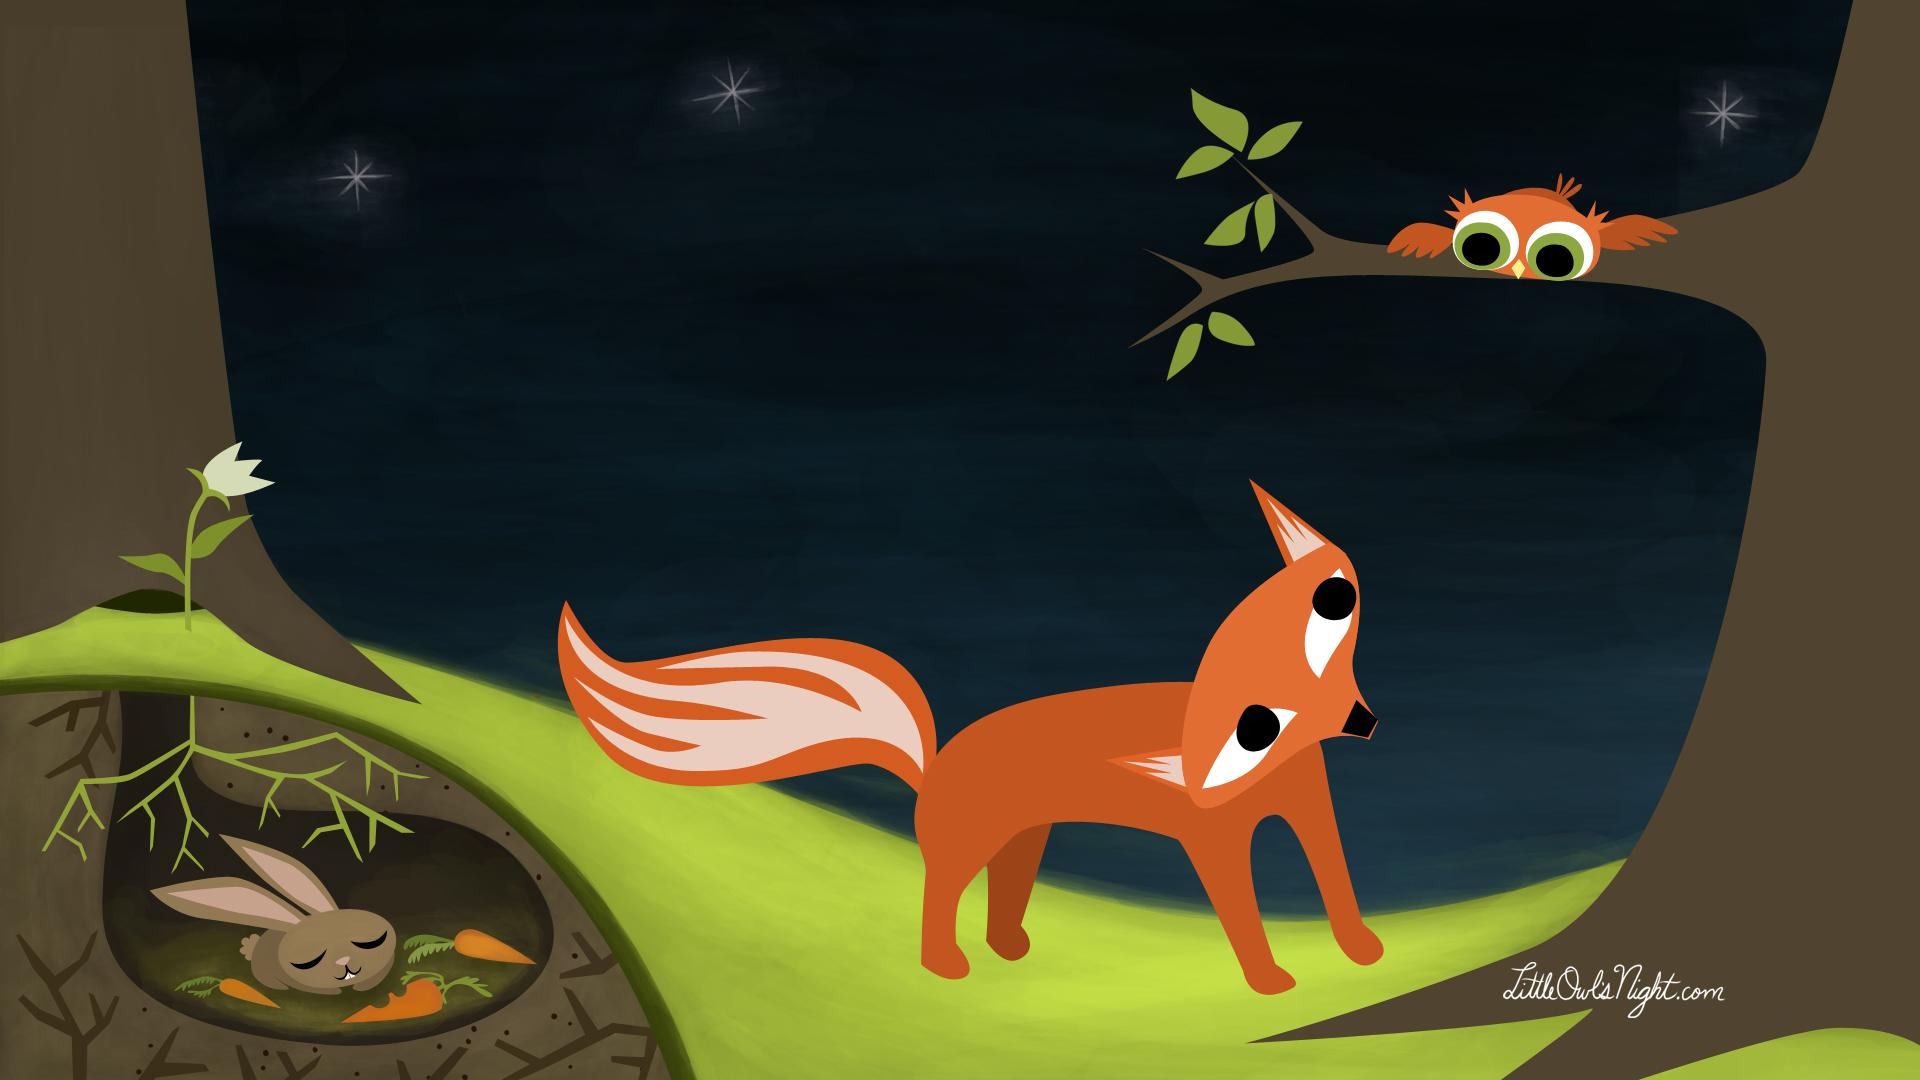 Off The Shelf:  Little Owl's Night